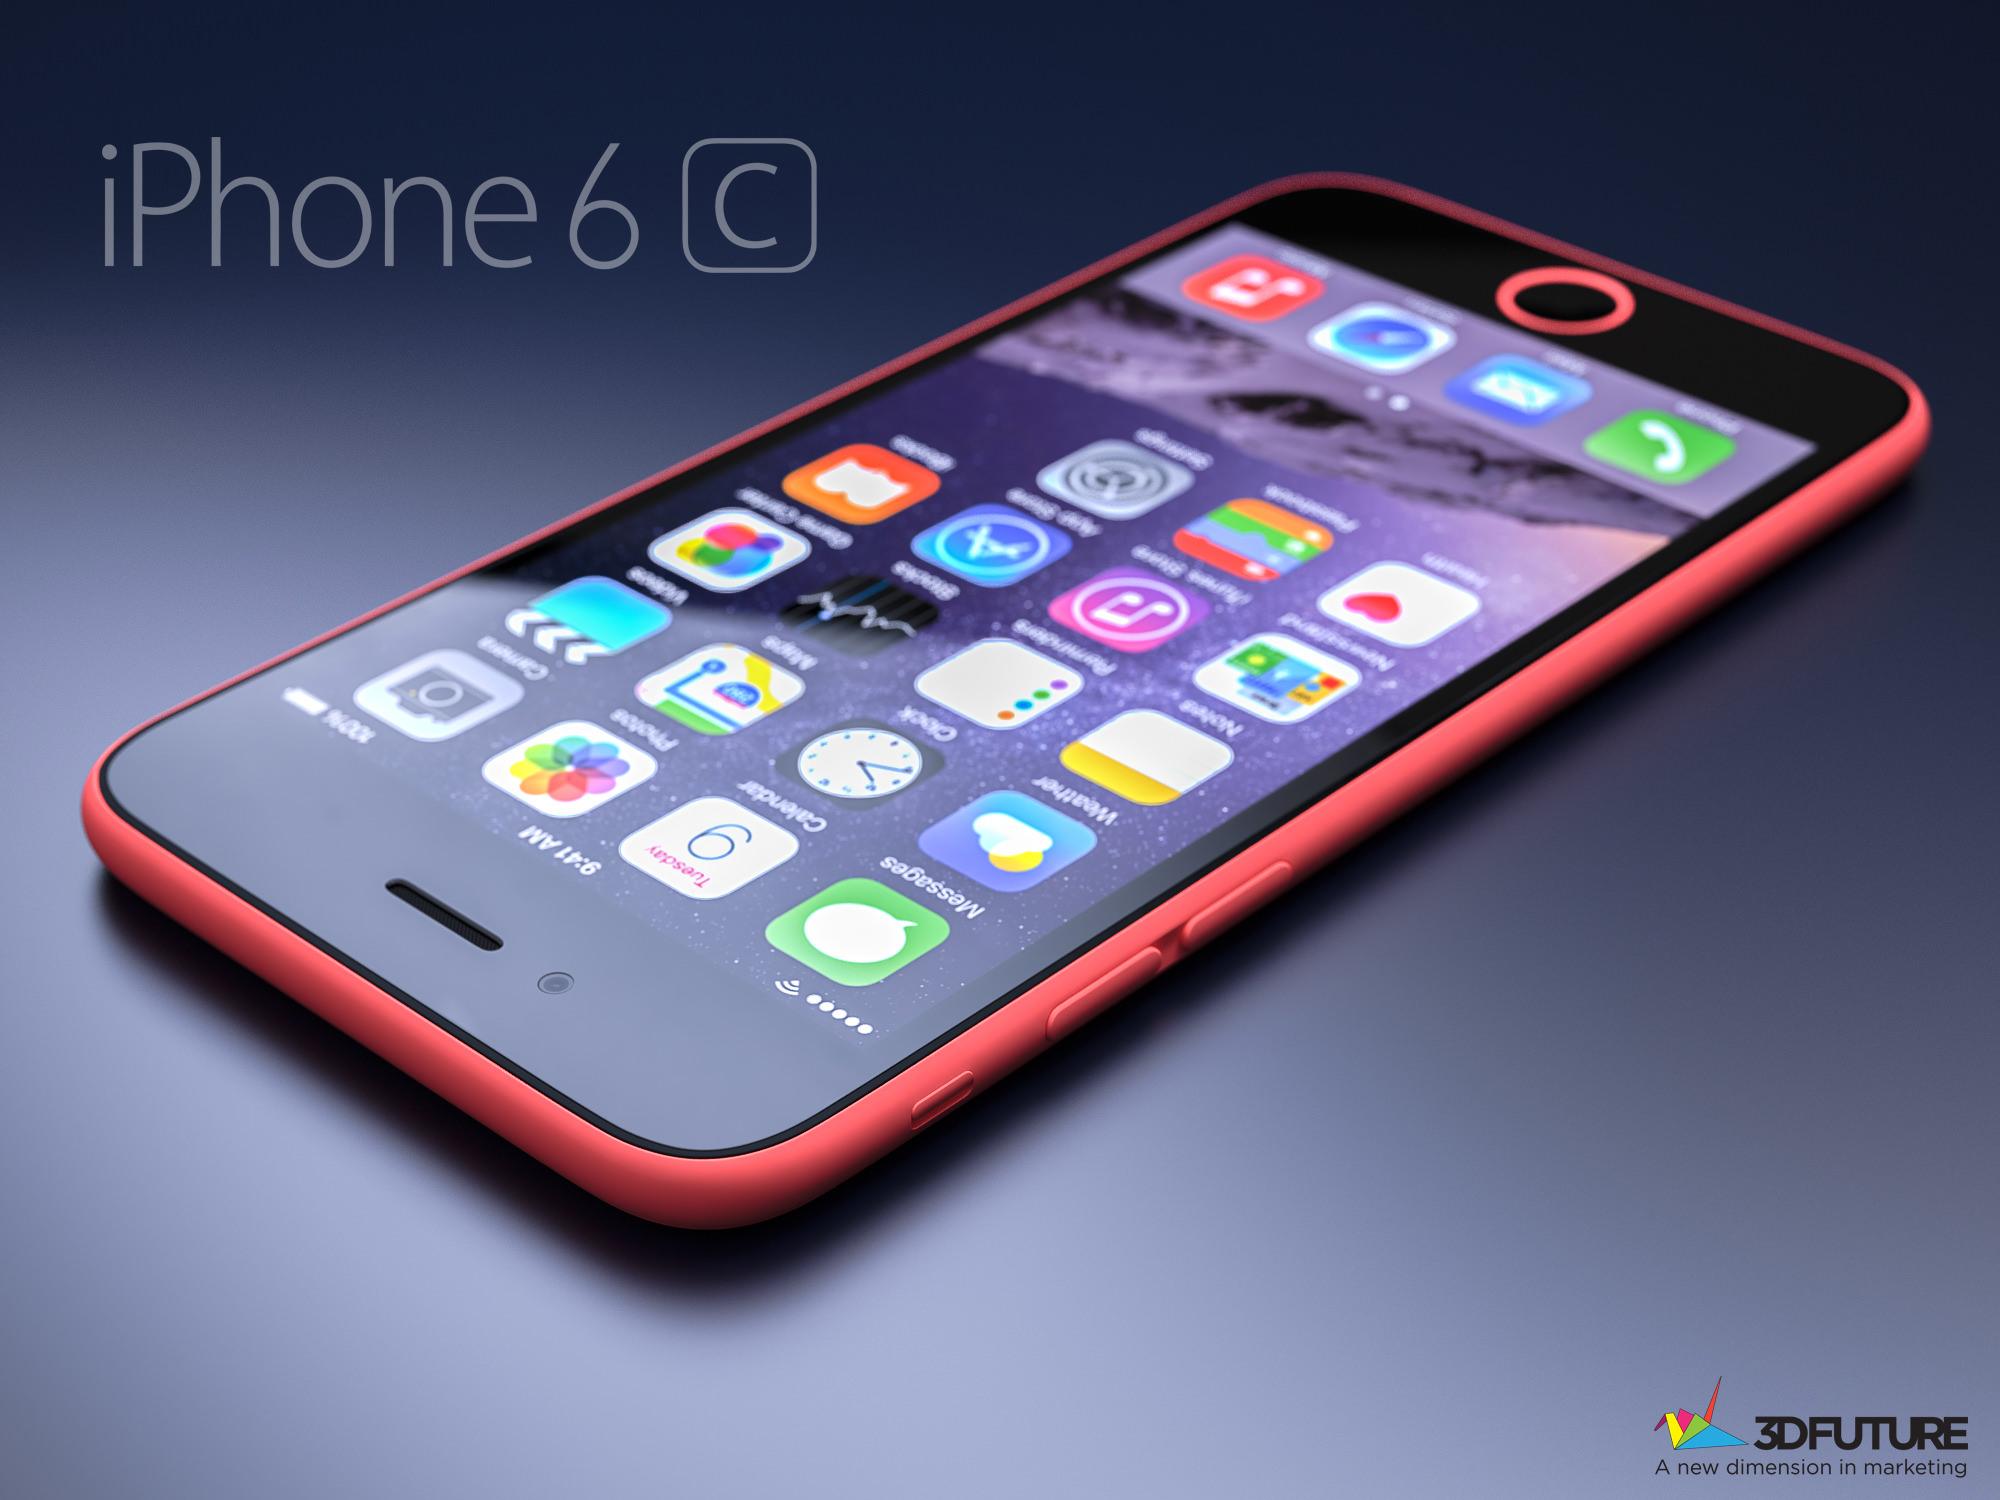 iPhone 6c konsepti ortaya ��kt�: ��k�nt�l� kamera, metal kasa ve fazlas�